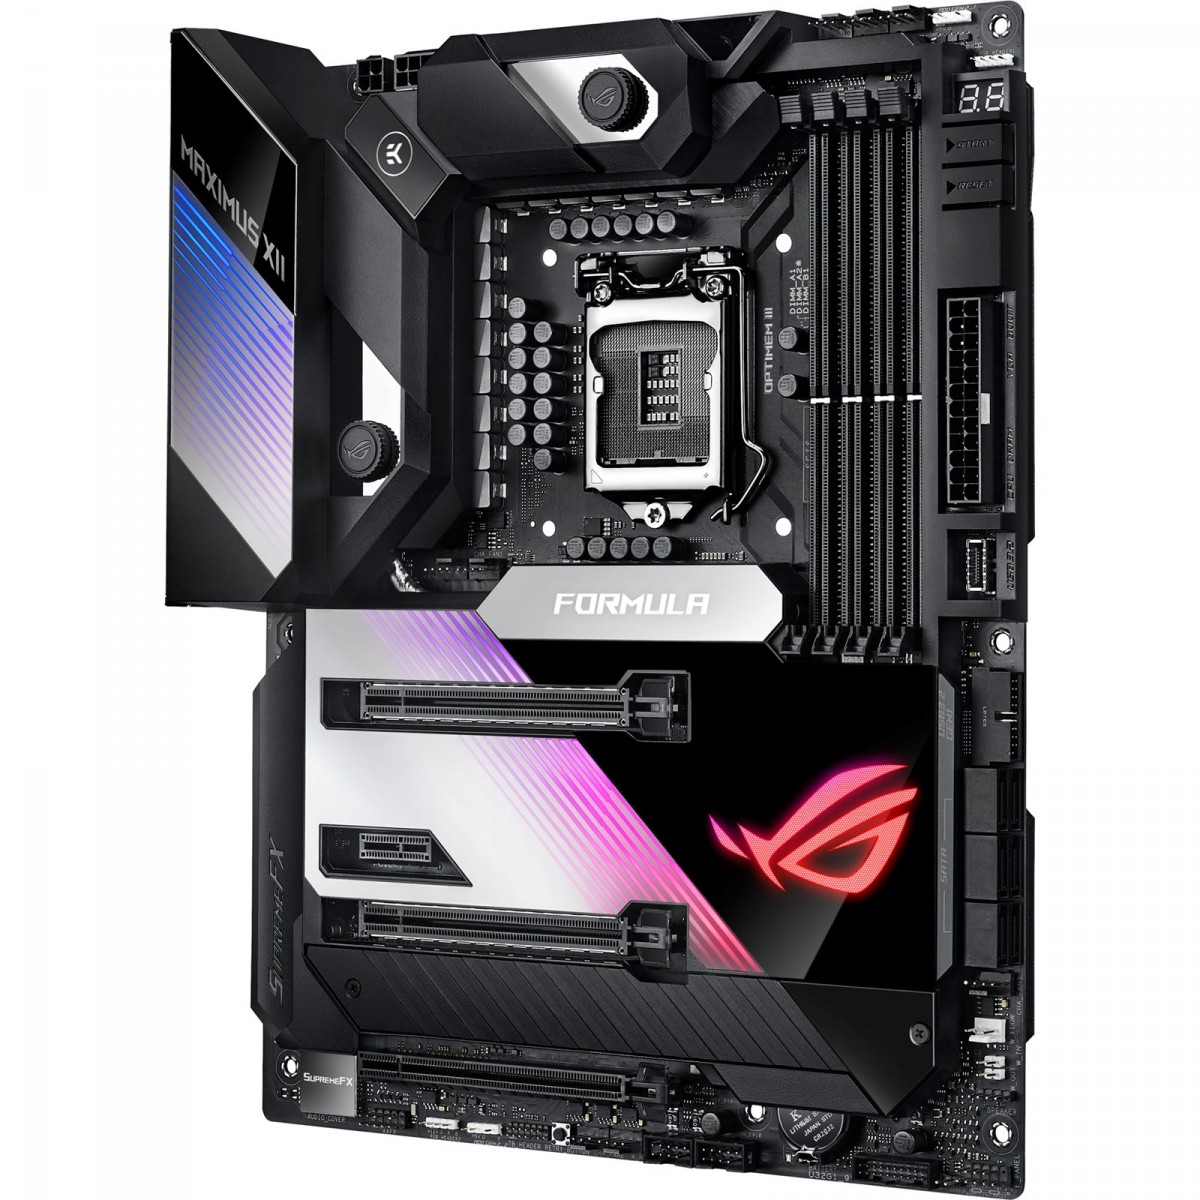 Placa Mãe Asus Rog Maximus XII Formula, Chipset Z490, Wi-Fi, Intel LGA 1200, ATX, DDR4